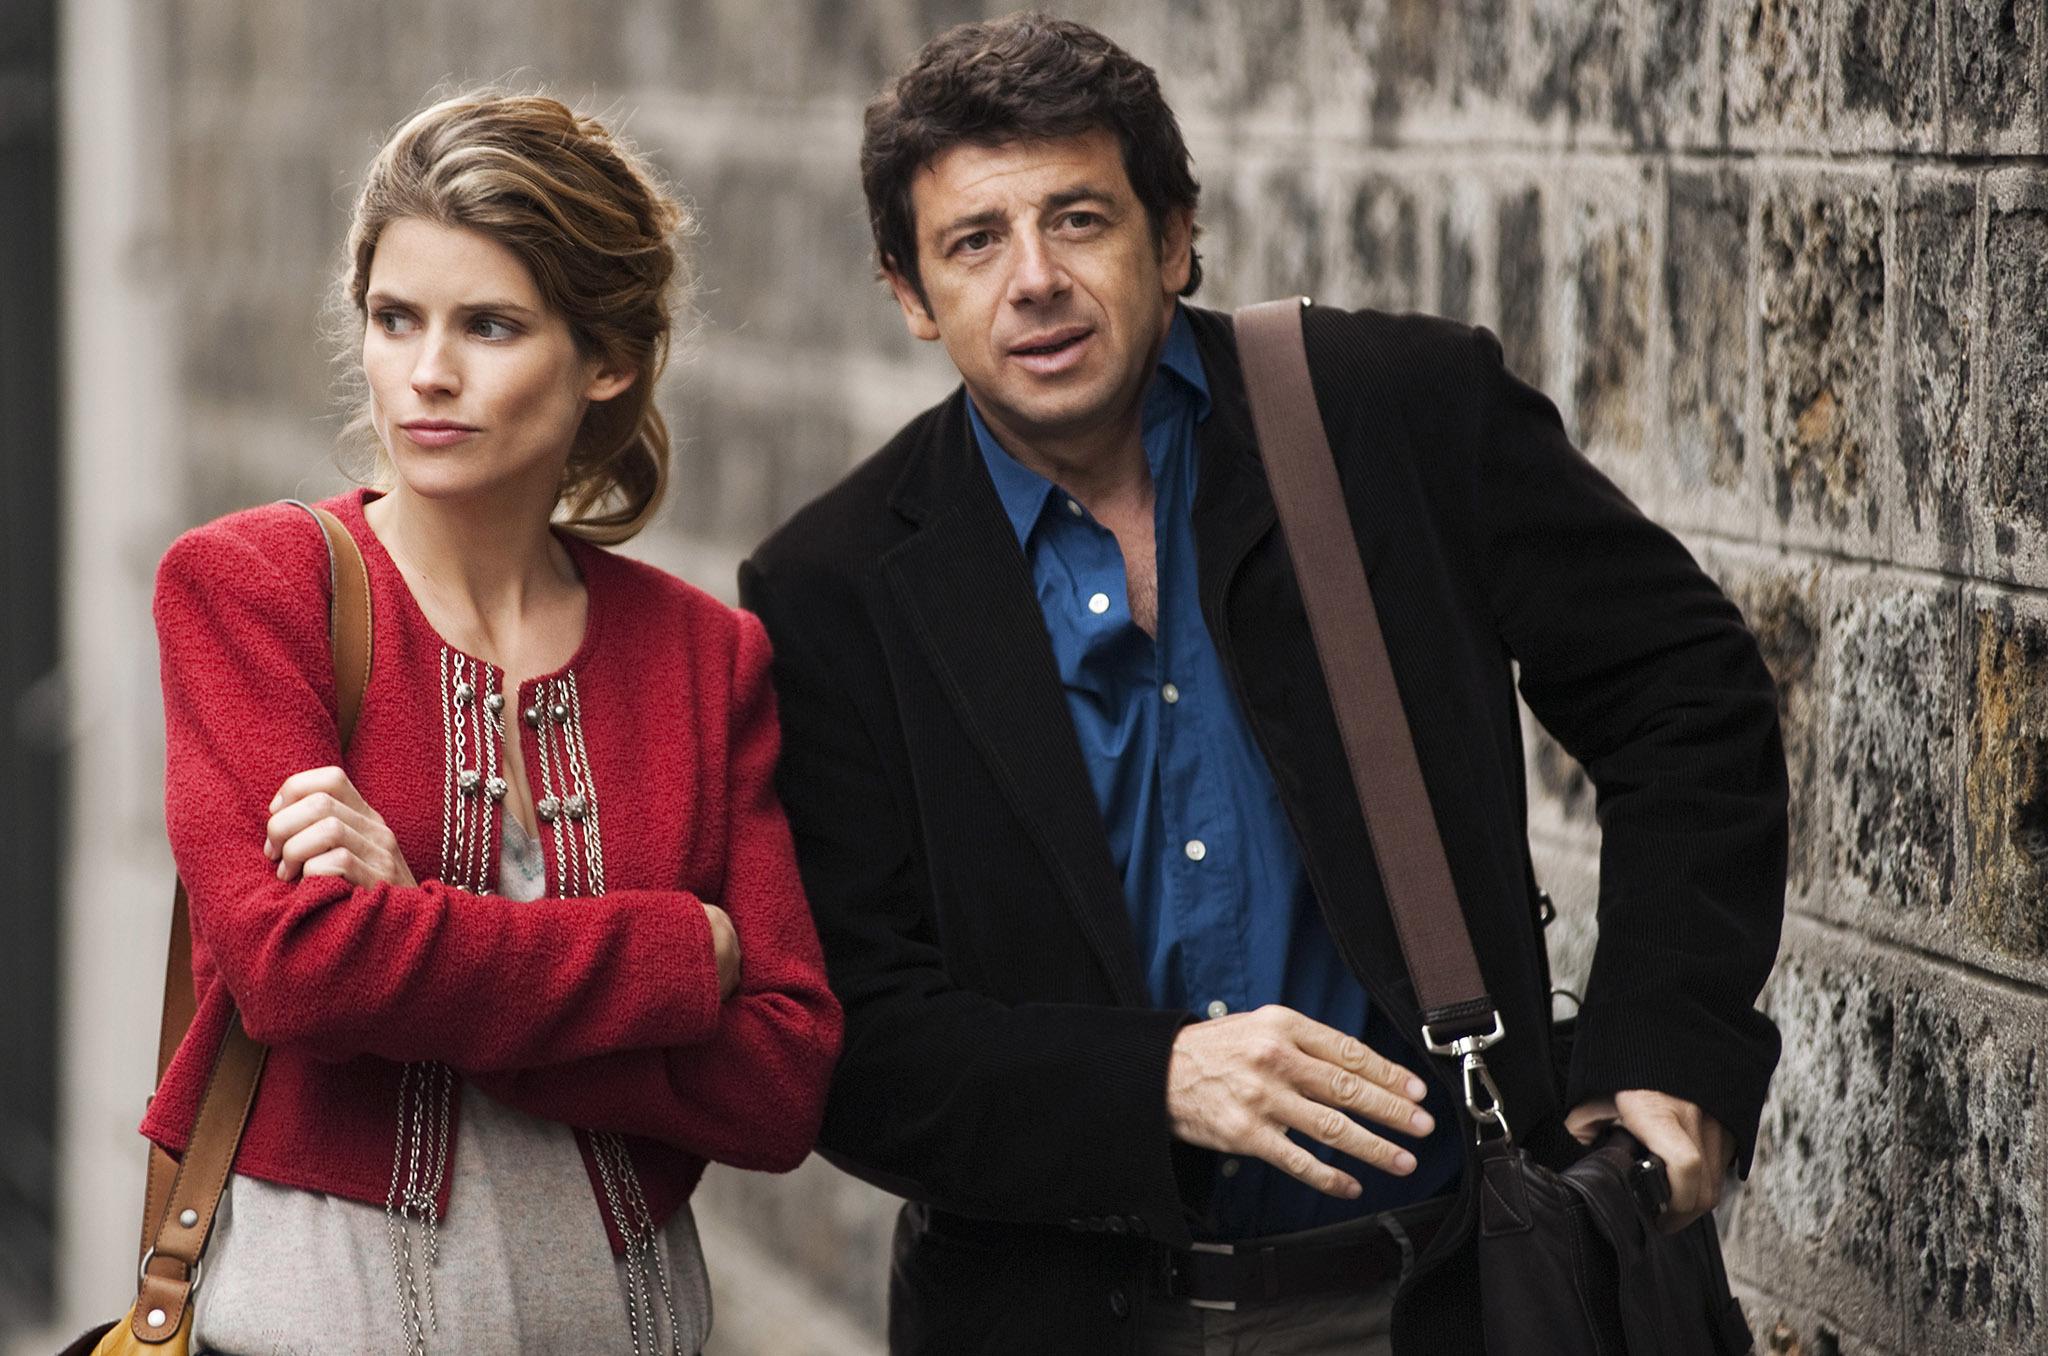 Paris Manhattan 2012 Directed By Sophie Brunet Film Review